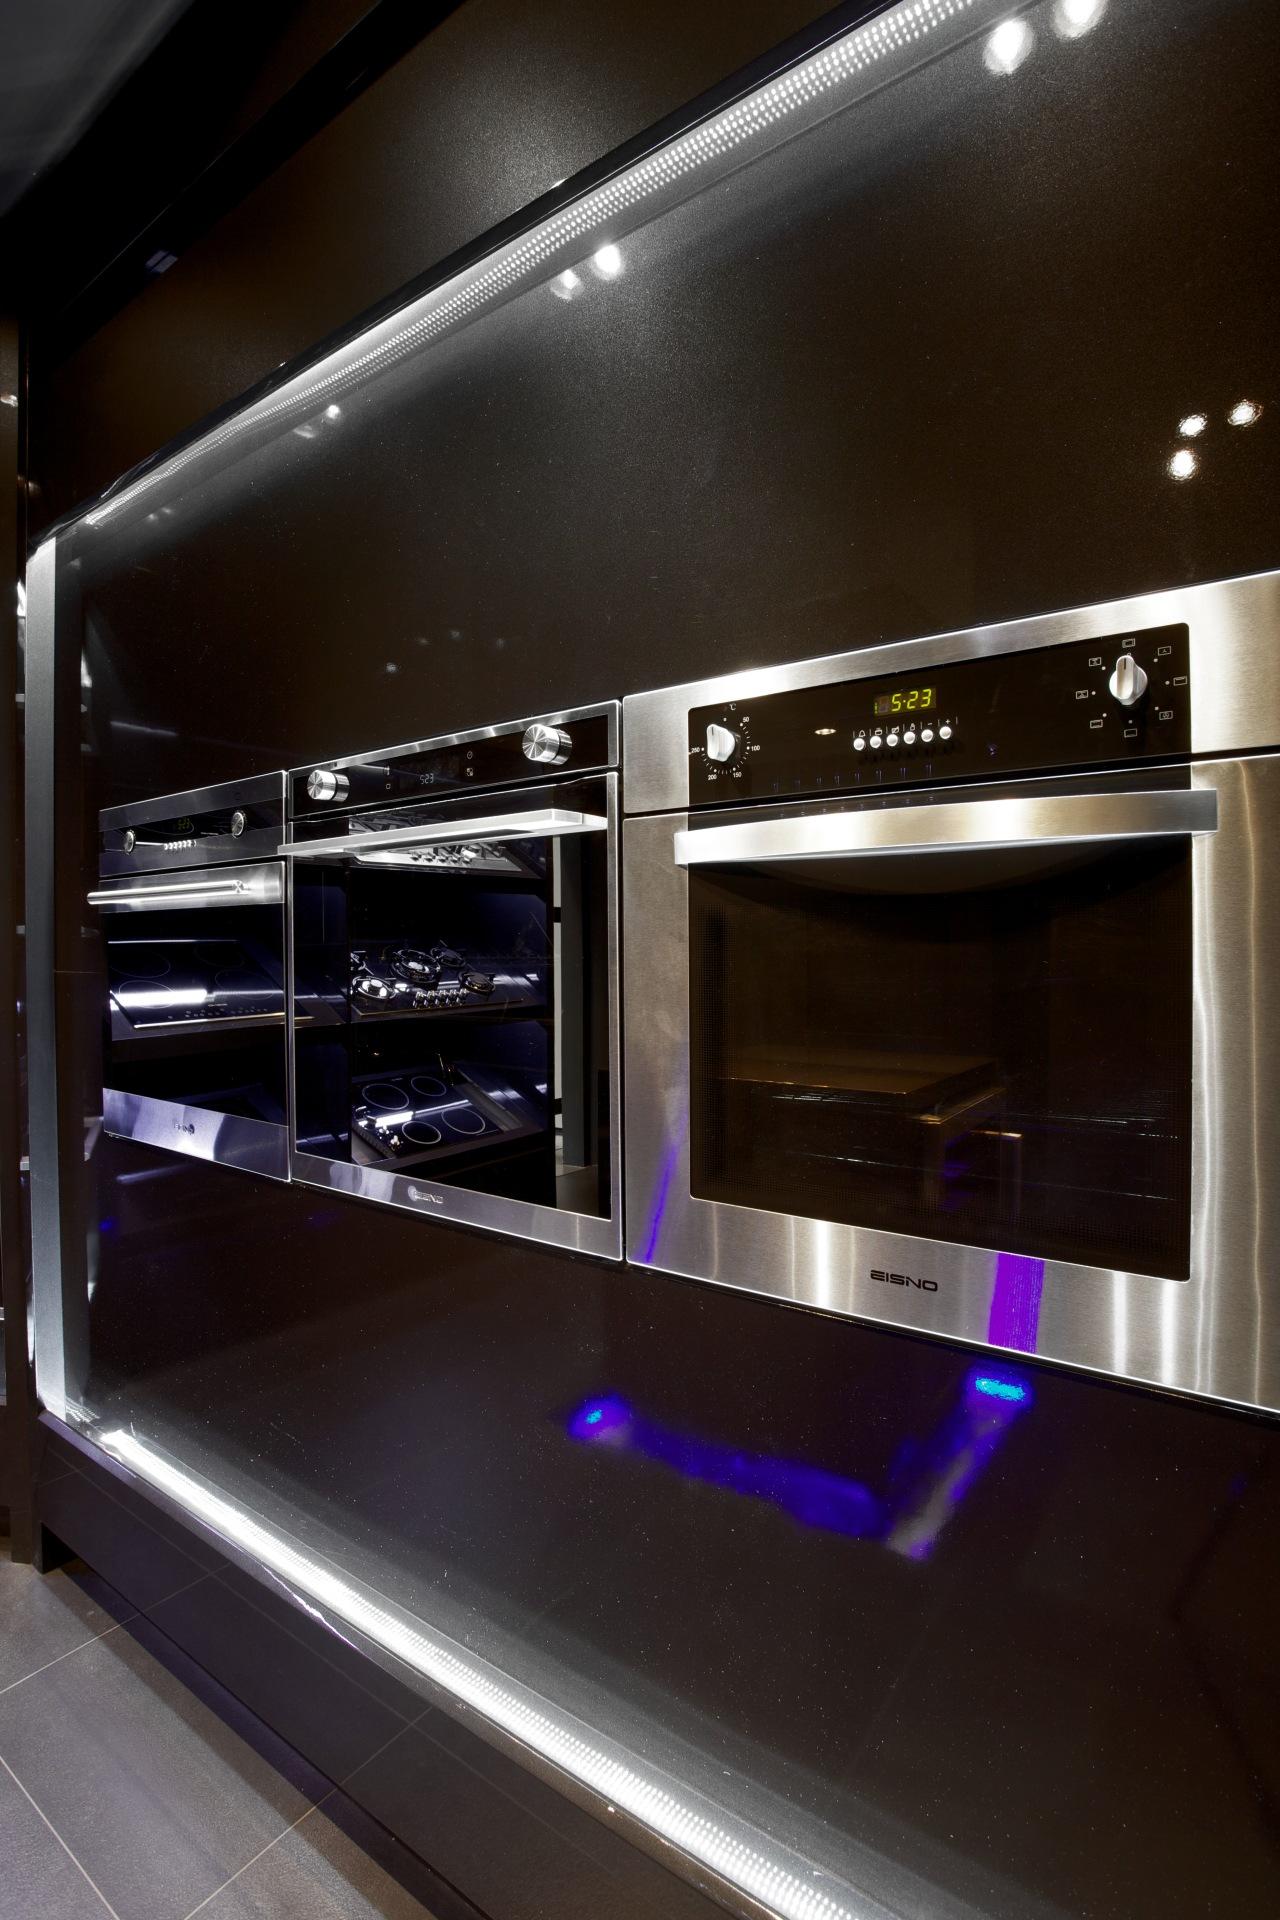 Italian designed appliances by Eisno Lifetech electronics, home appliance, kitchen appliance, technology, black